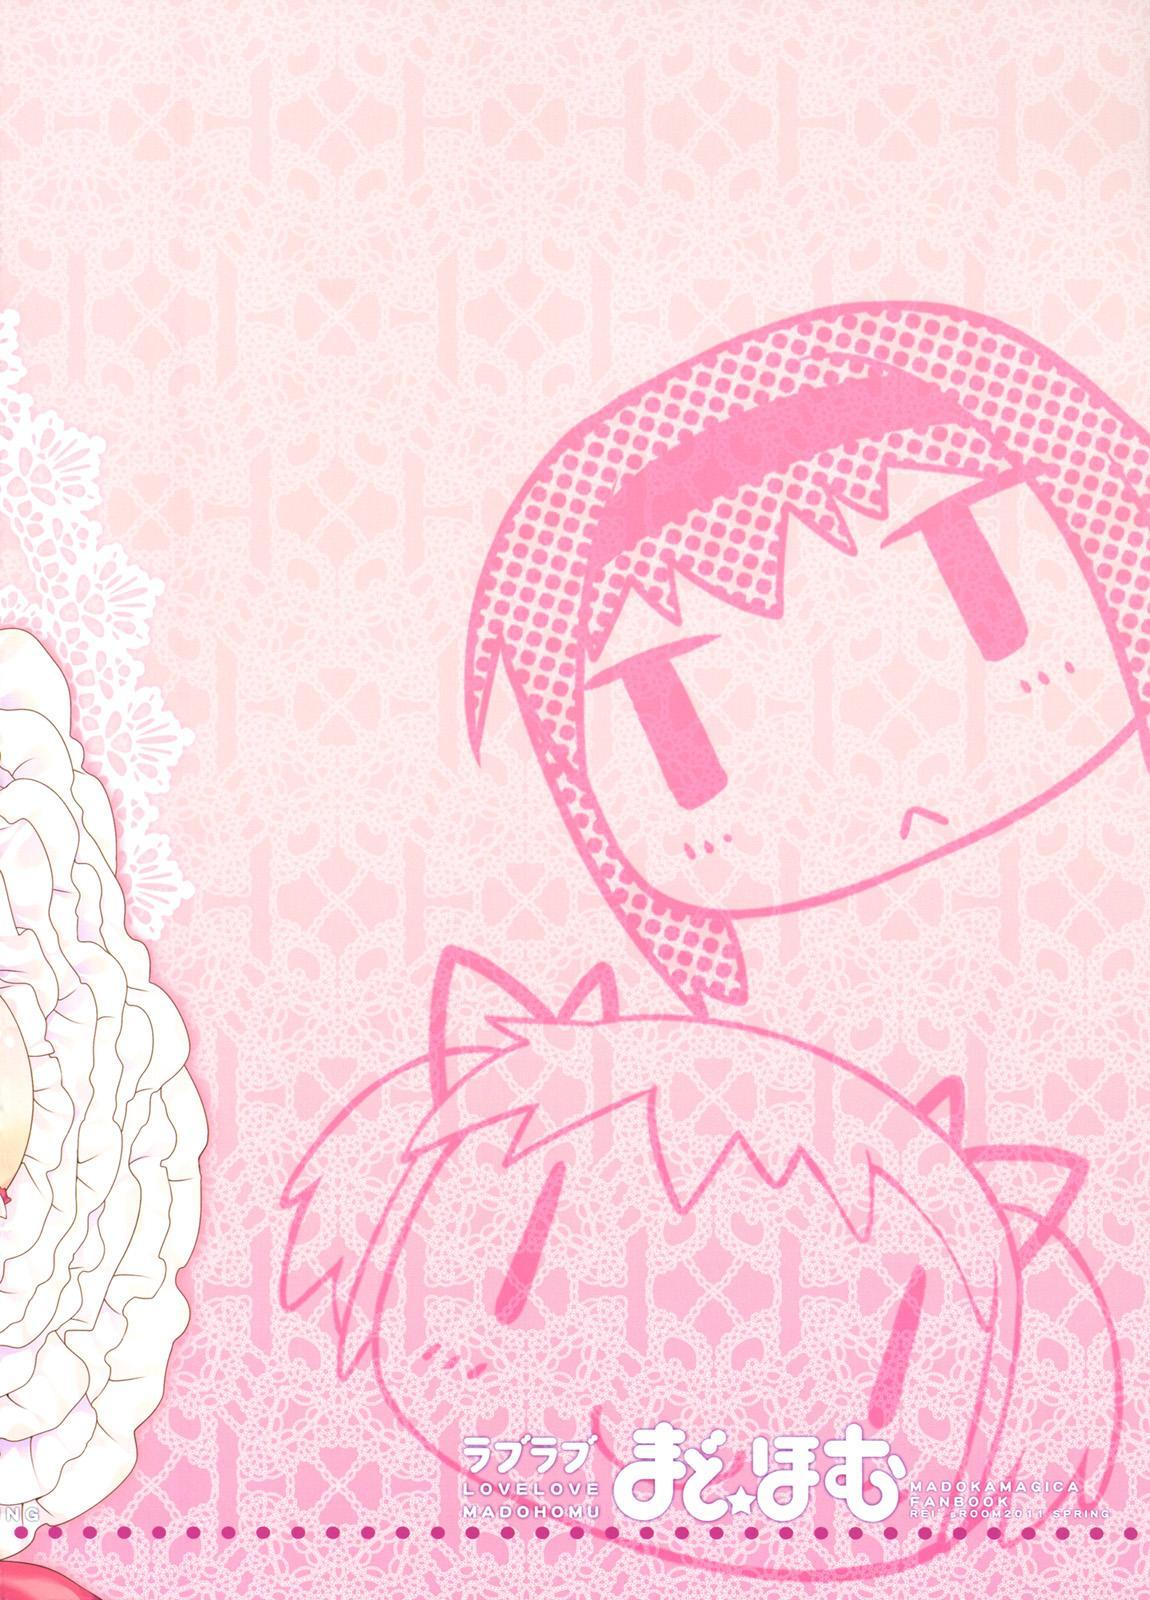 Love Love Mado☆Homu 20